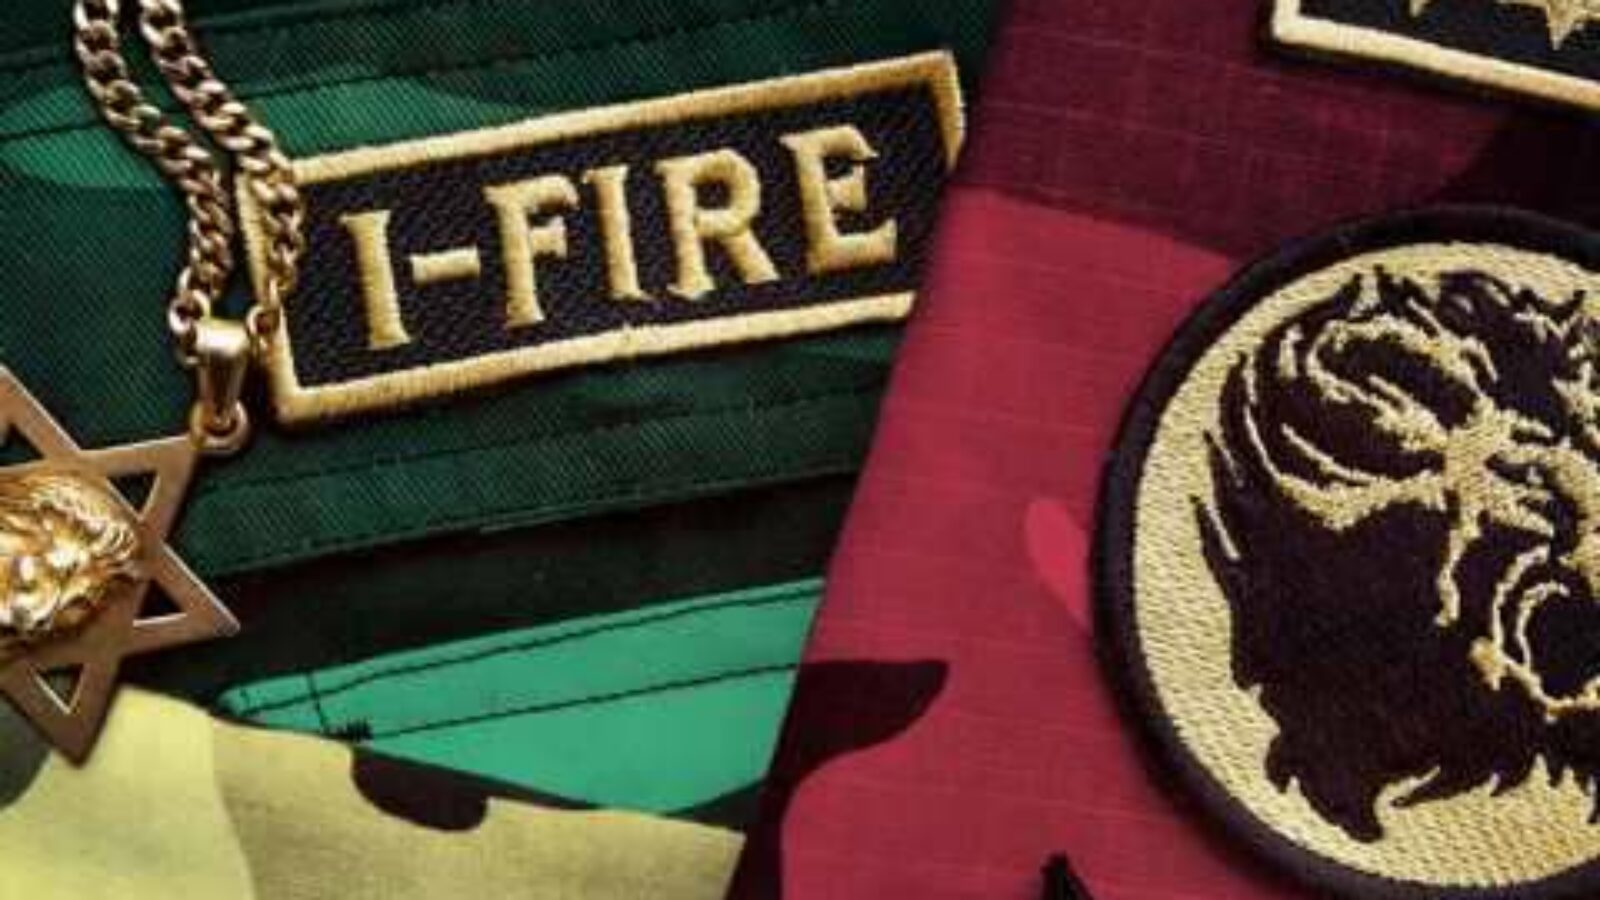 I-FIRE Salut!